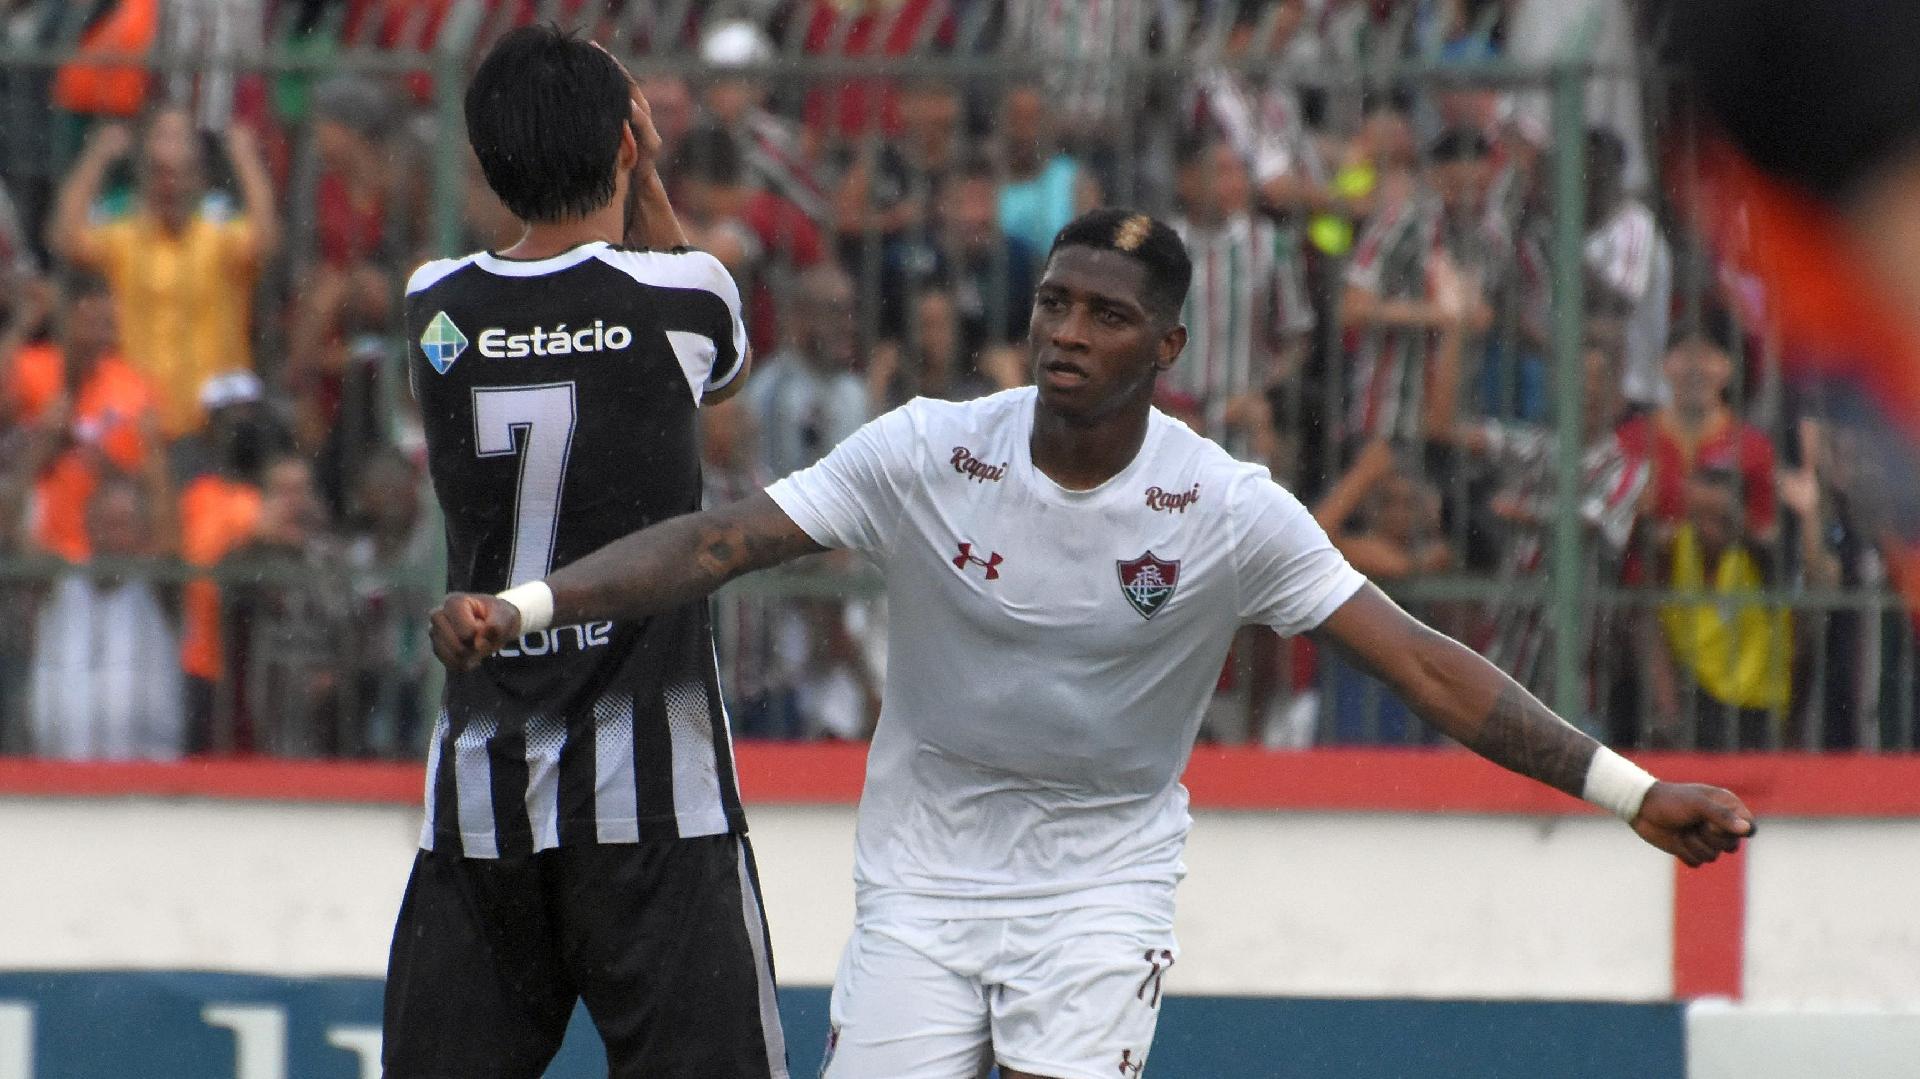 Yony Gonzalez comemora gol do Fluminense contra o Resende pela Taça Rio